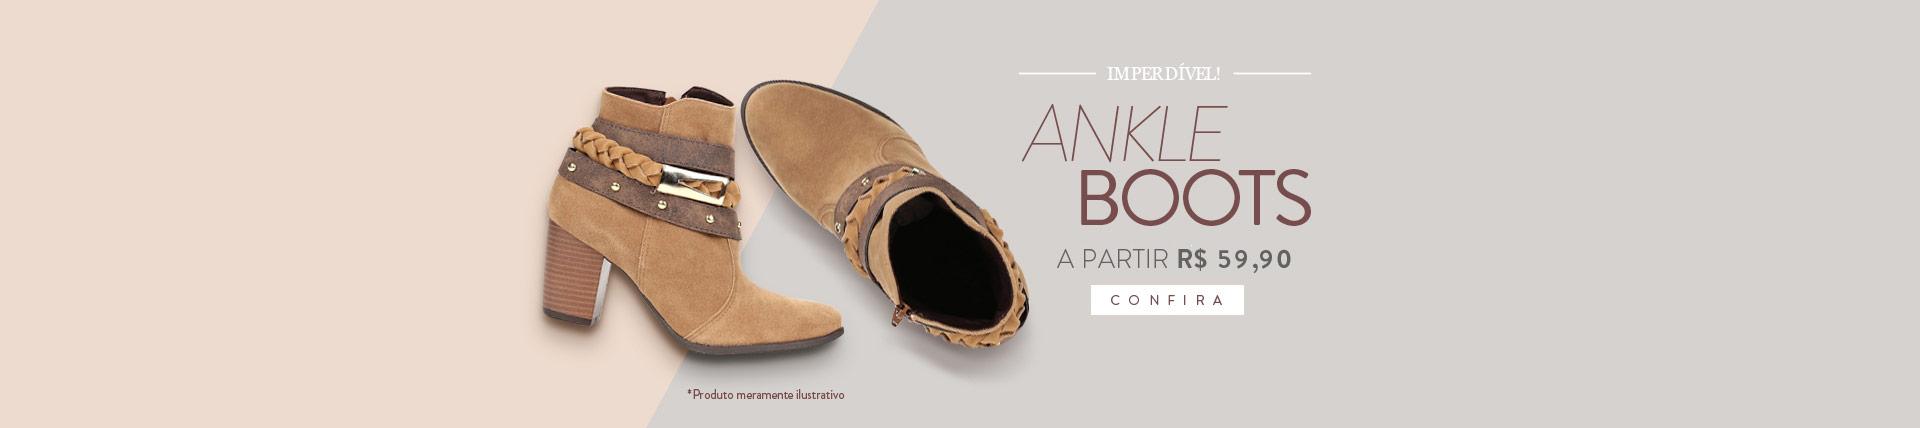 Imperdível! Ankle Boots